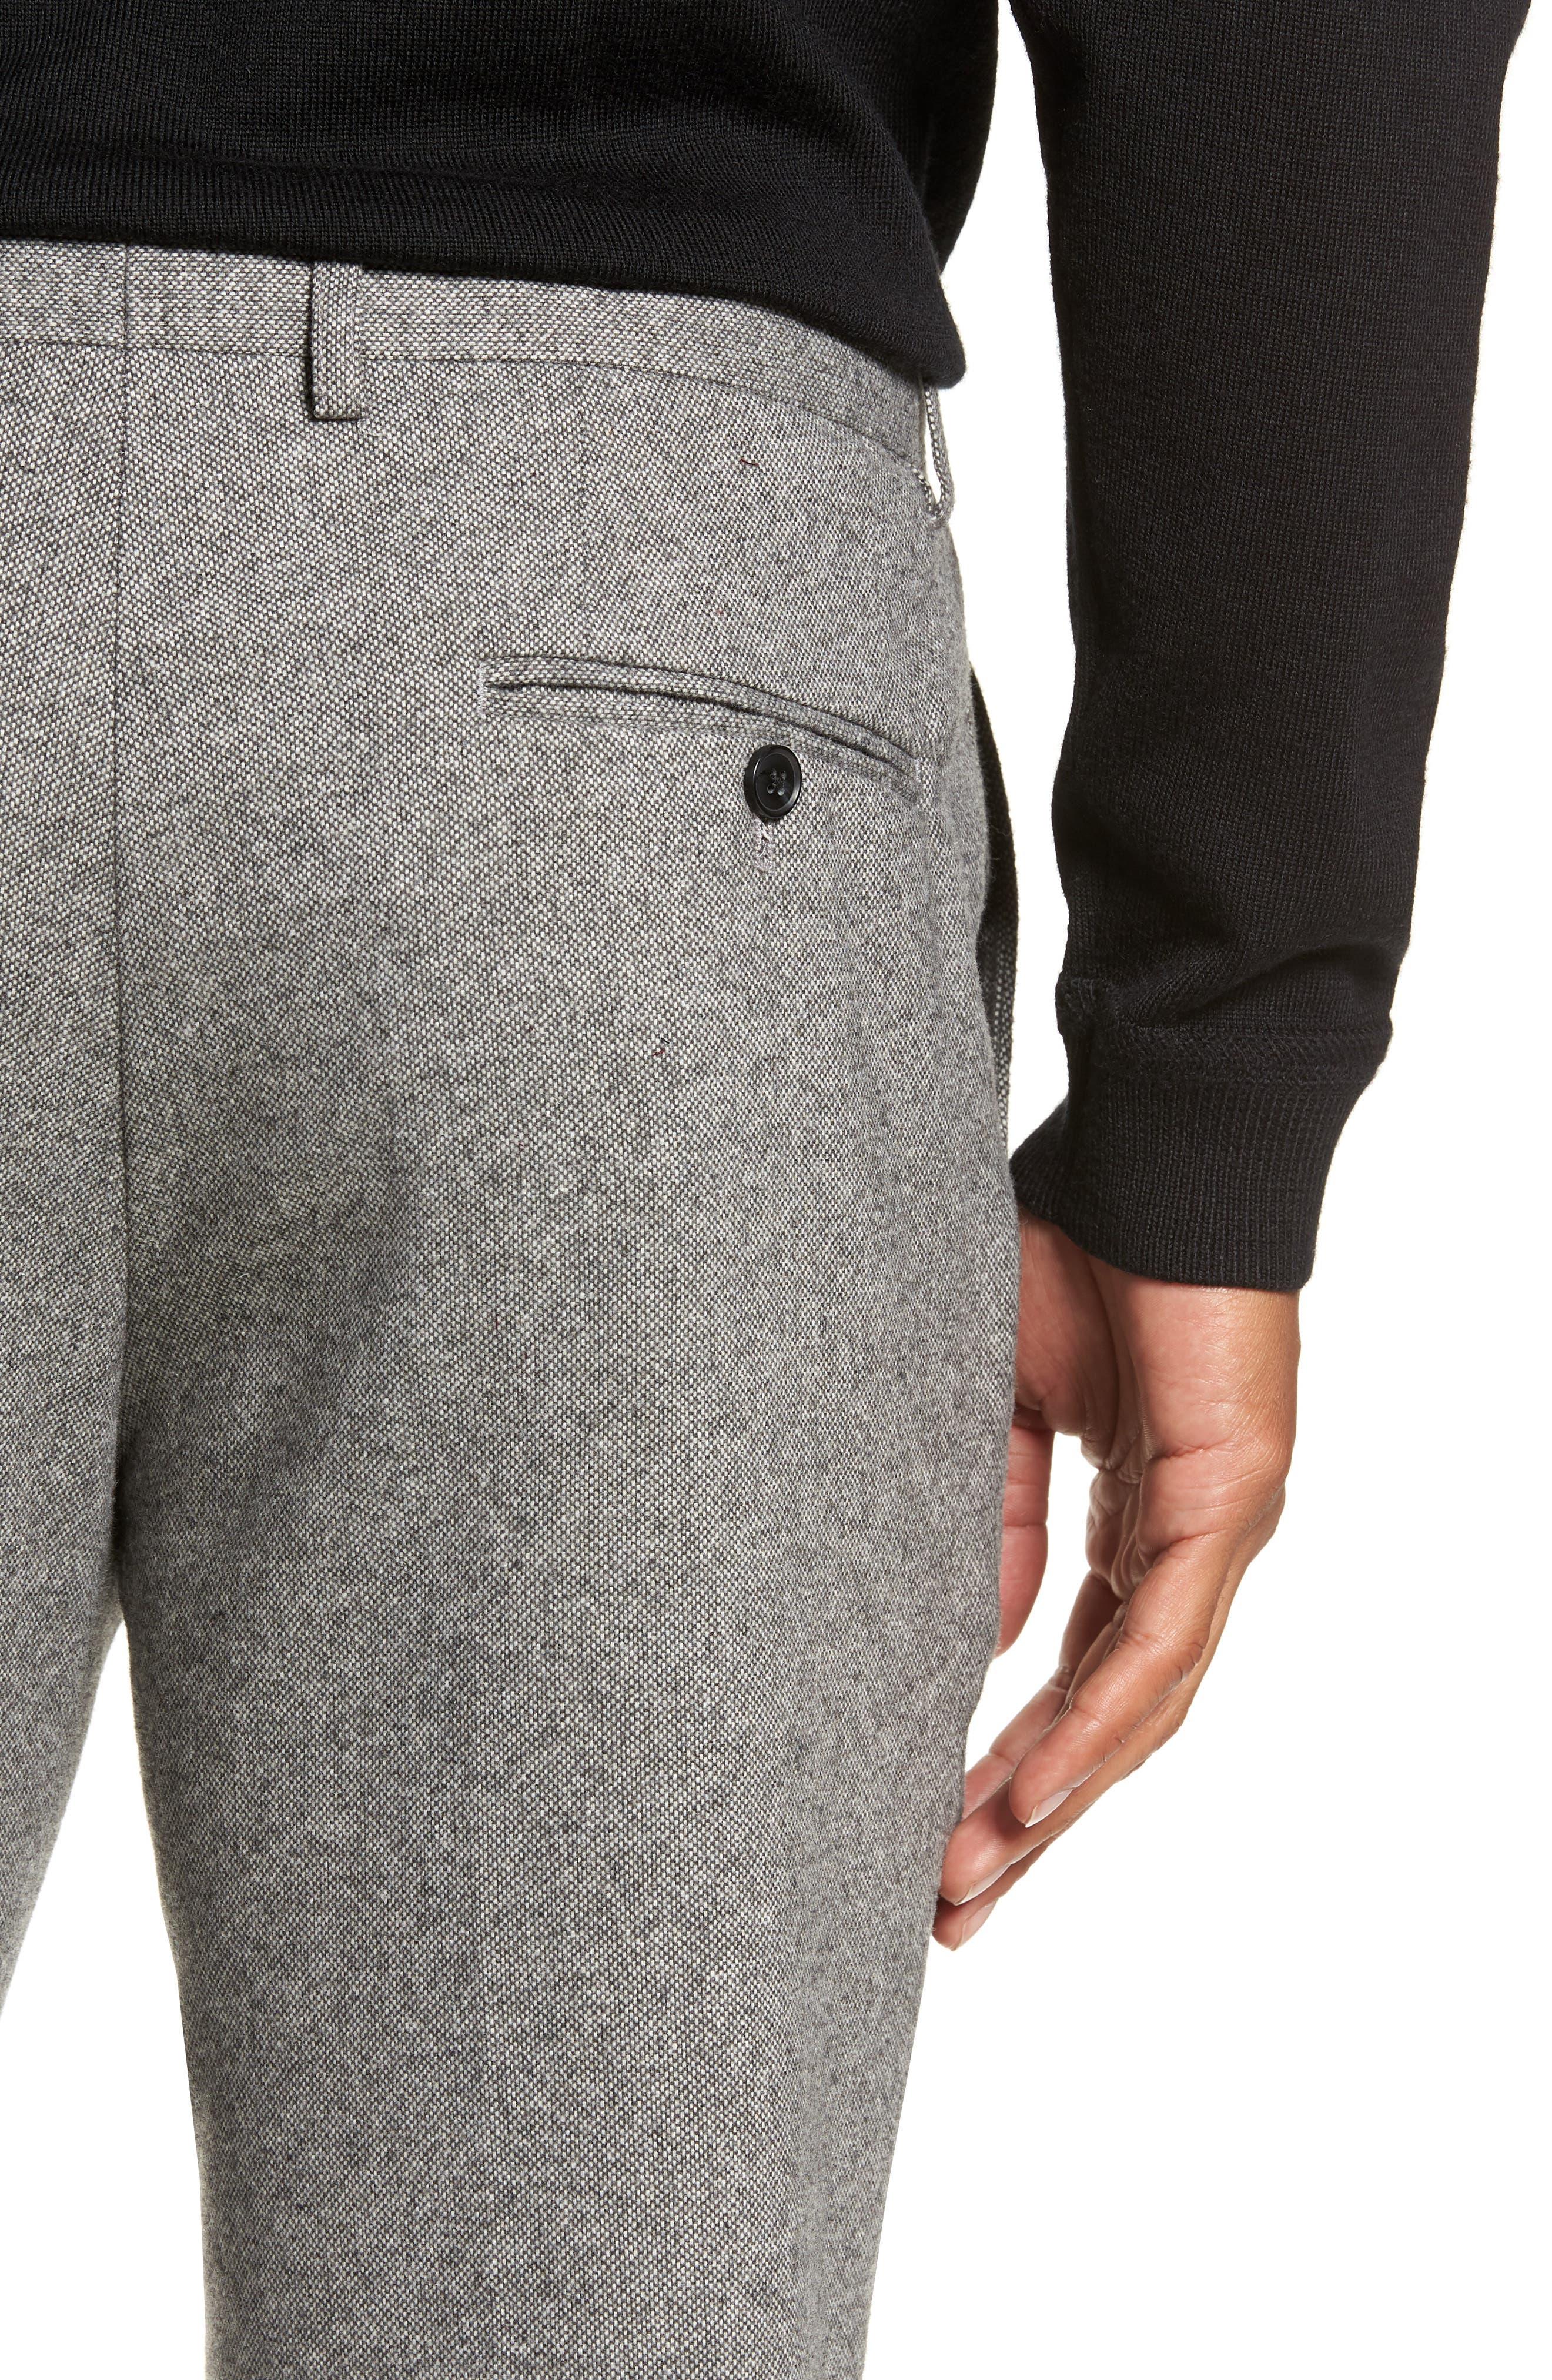 Phantom Slim Fit Pants,                             Alternate thumbnail 4, color,                             054